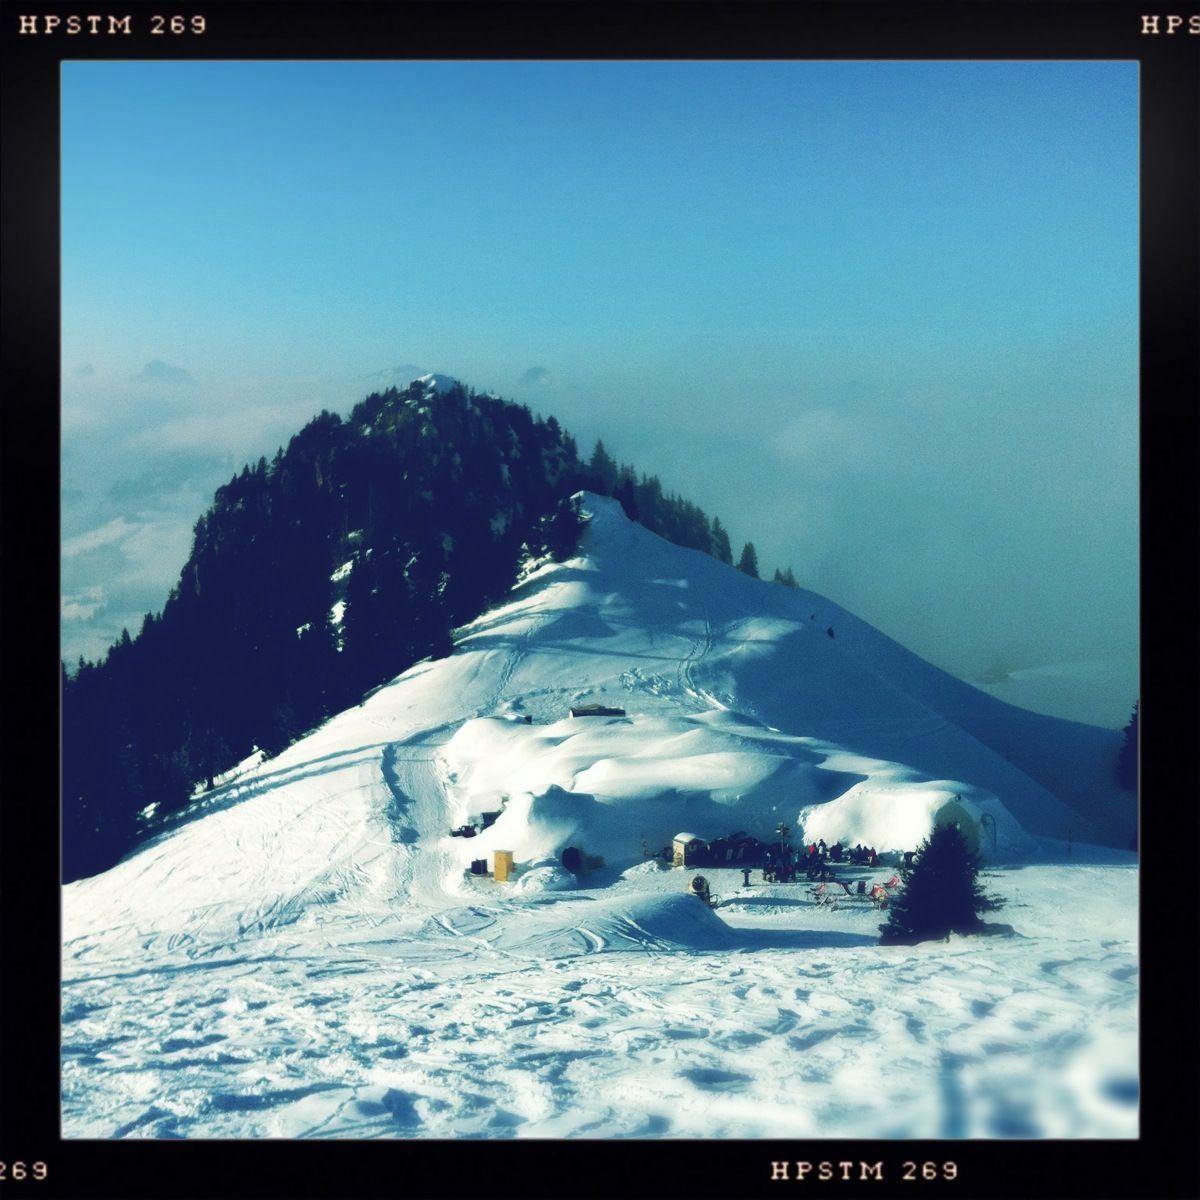 Wintersport in Gastaad17